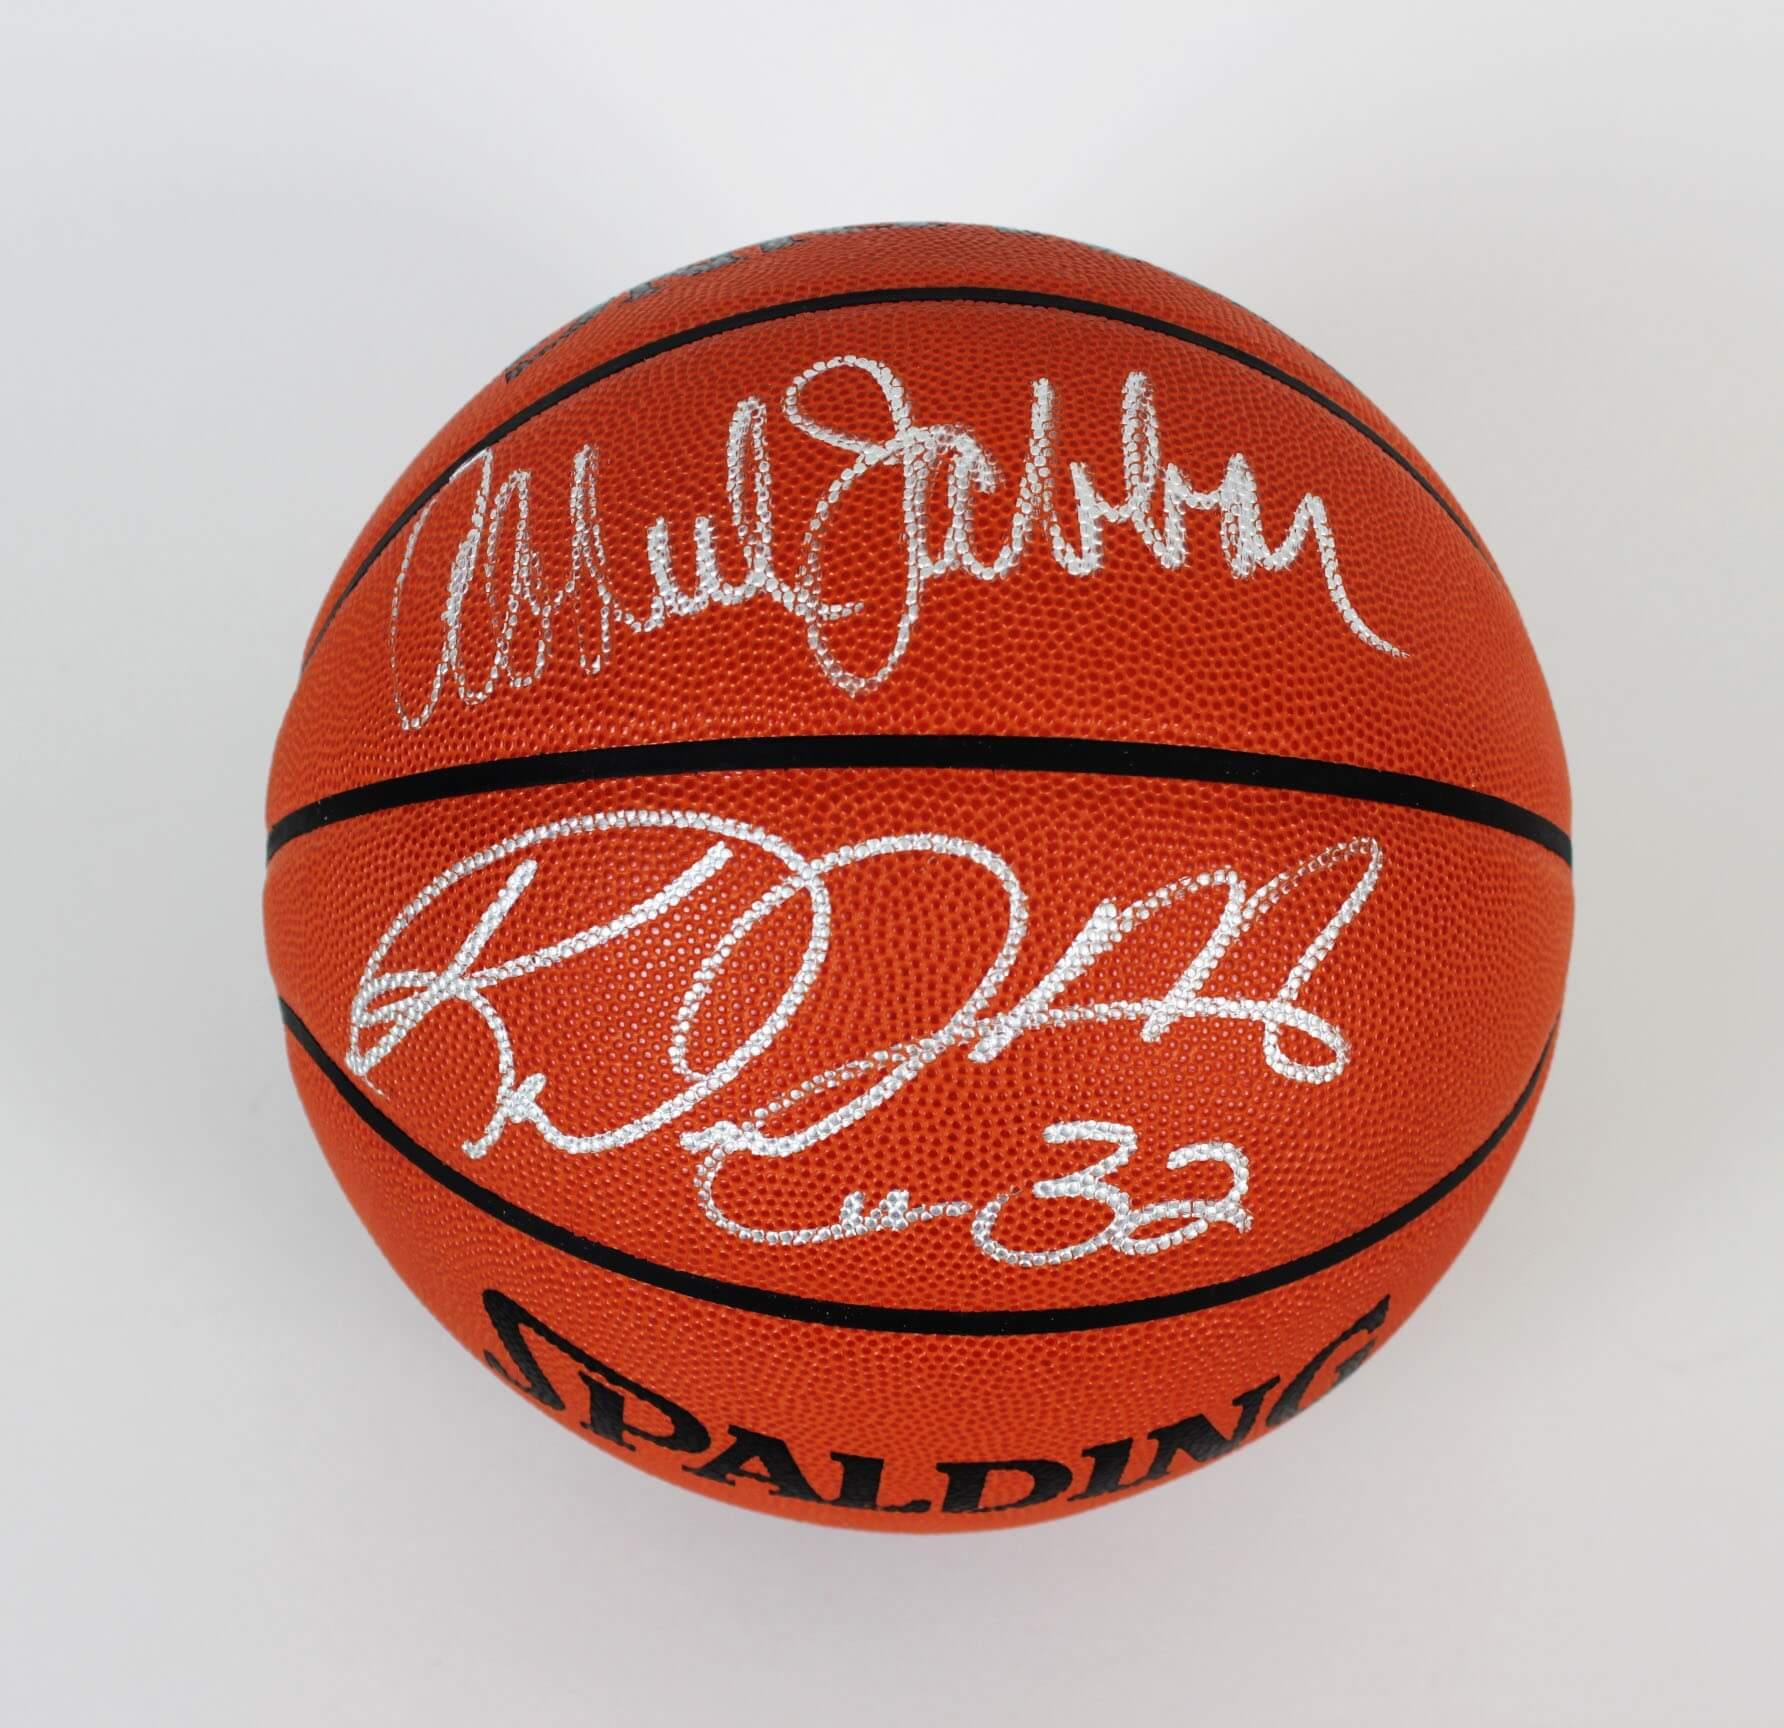 Lakers Kareem Abdul Jabbar & Jazz Karl Malone Signed Basketball - COA JSA